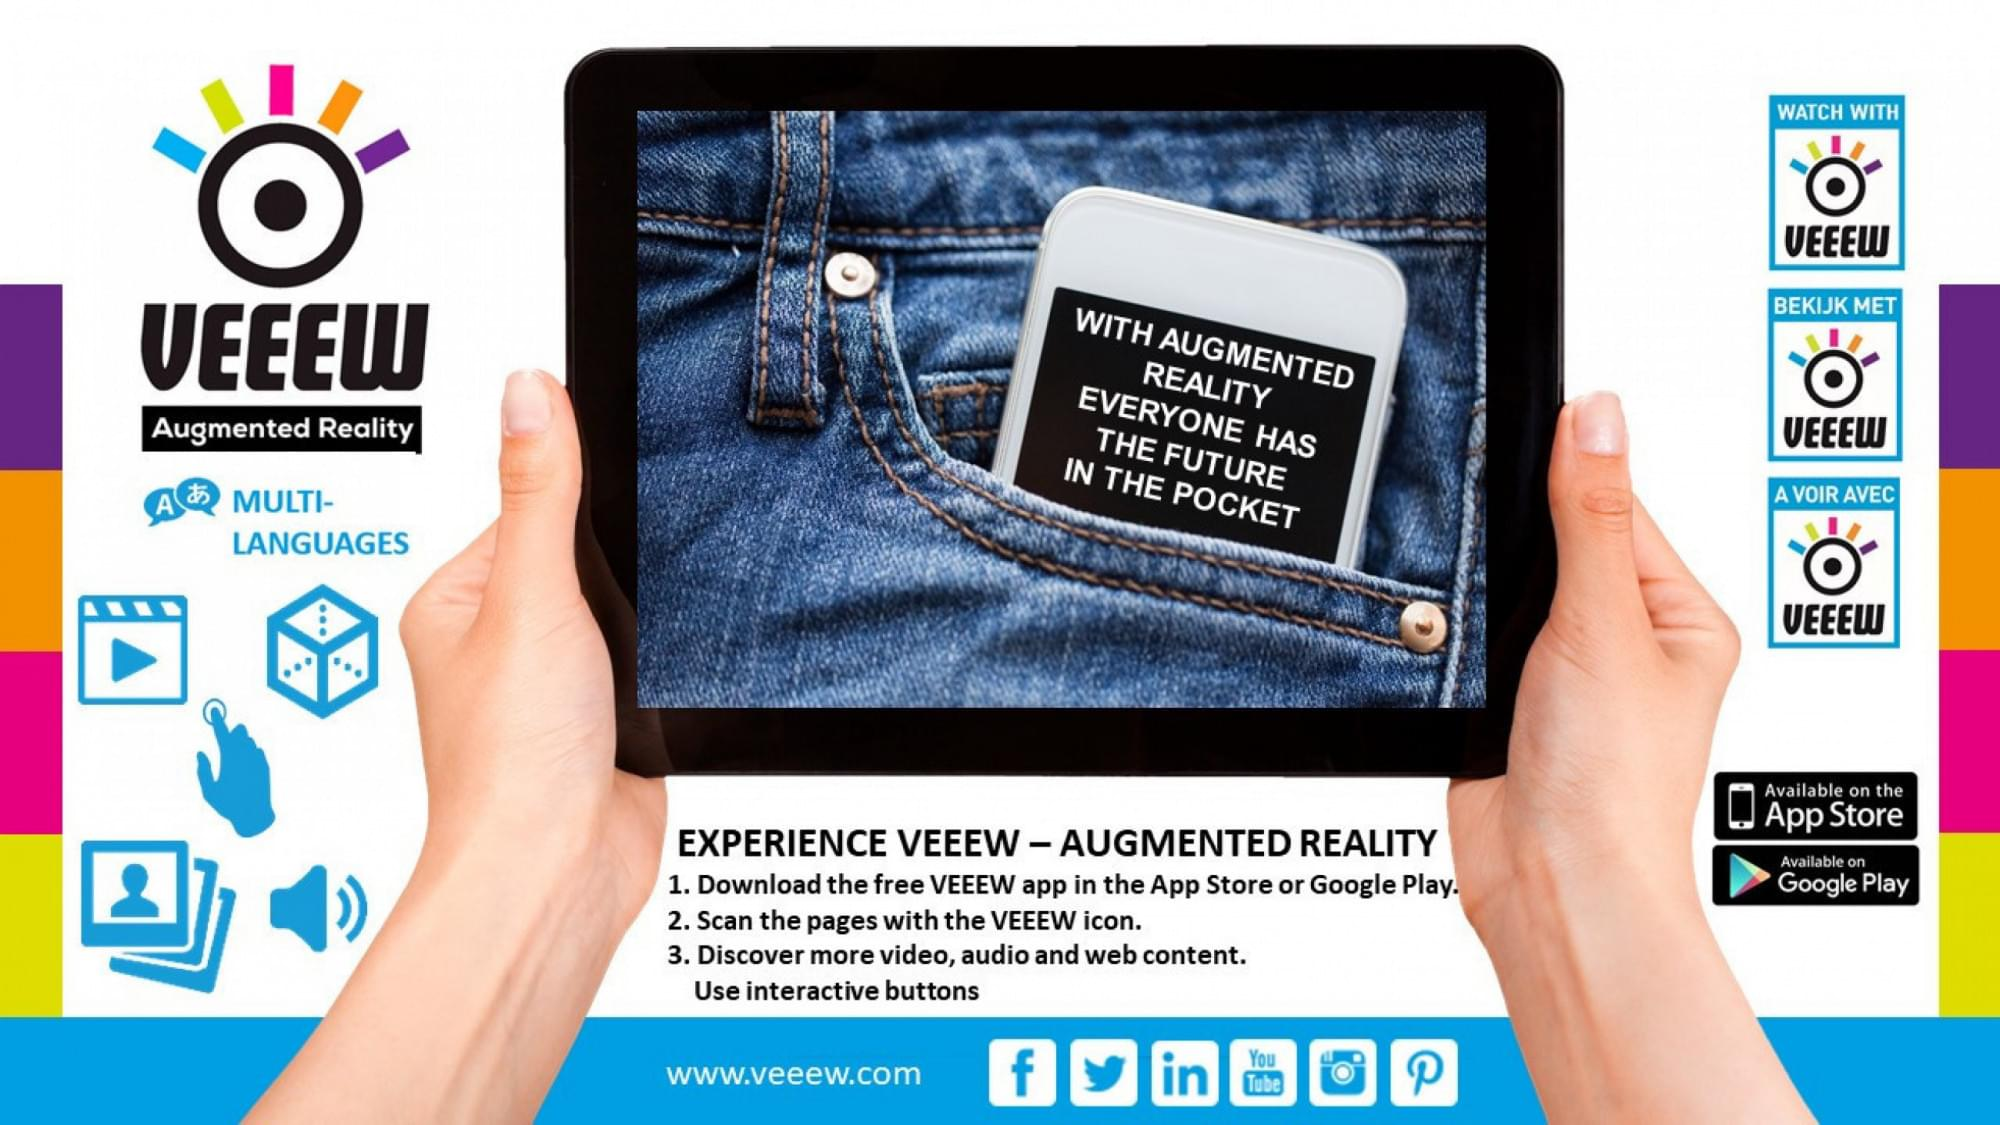 Website-Veeew-Jeans-Future-in-the-pocket-original